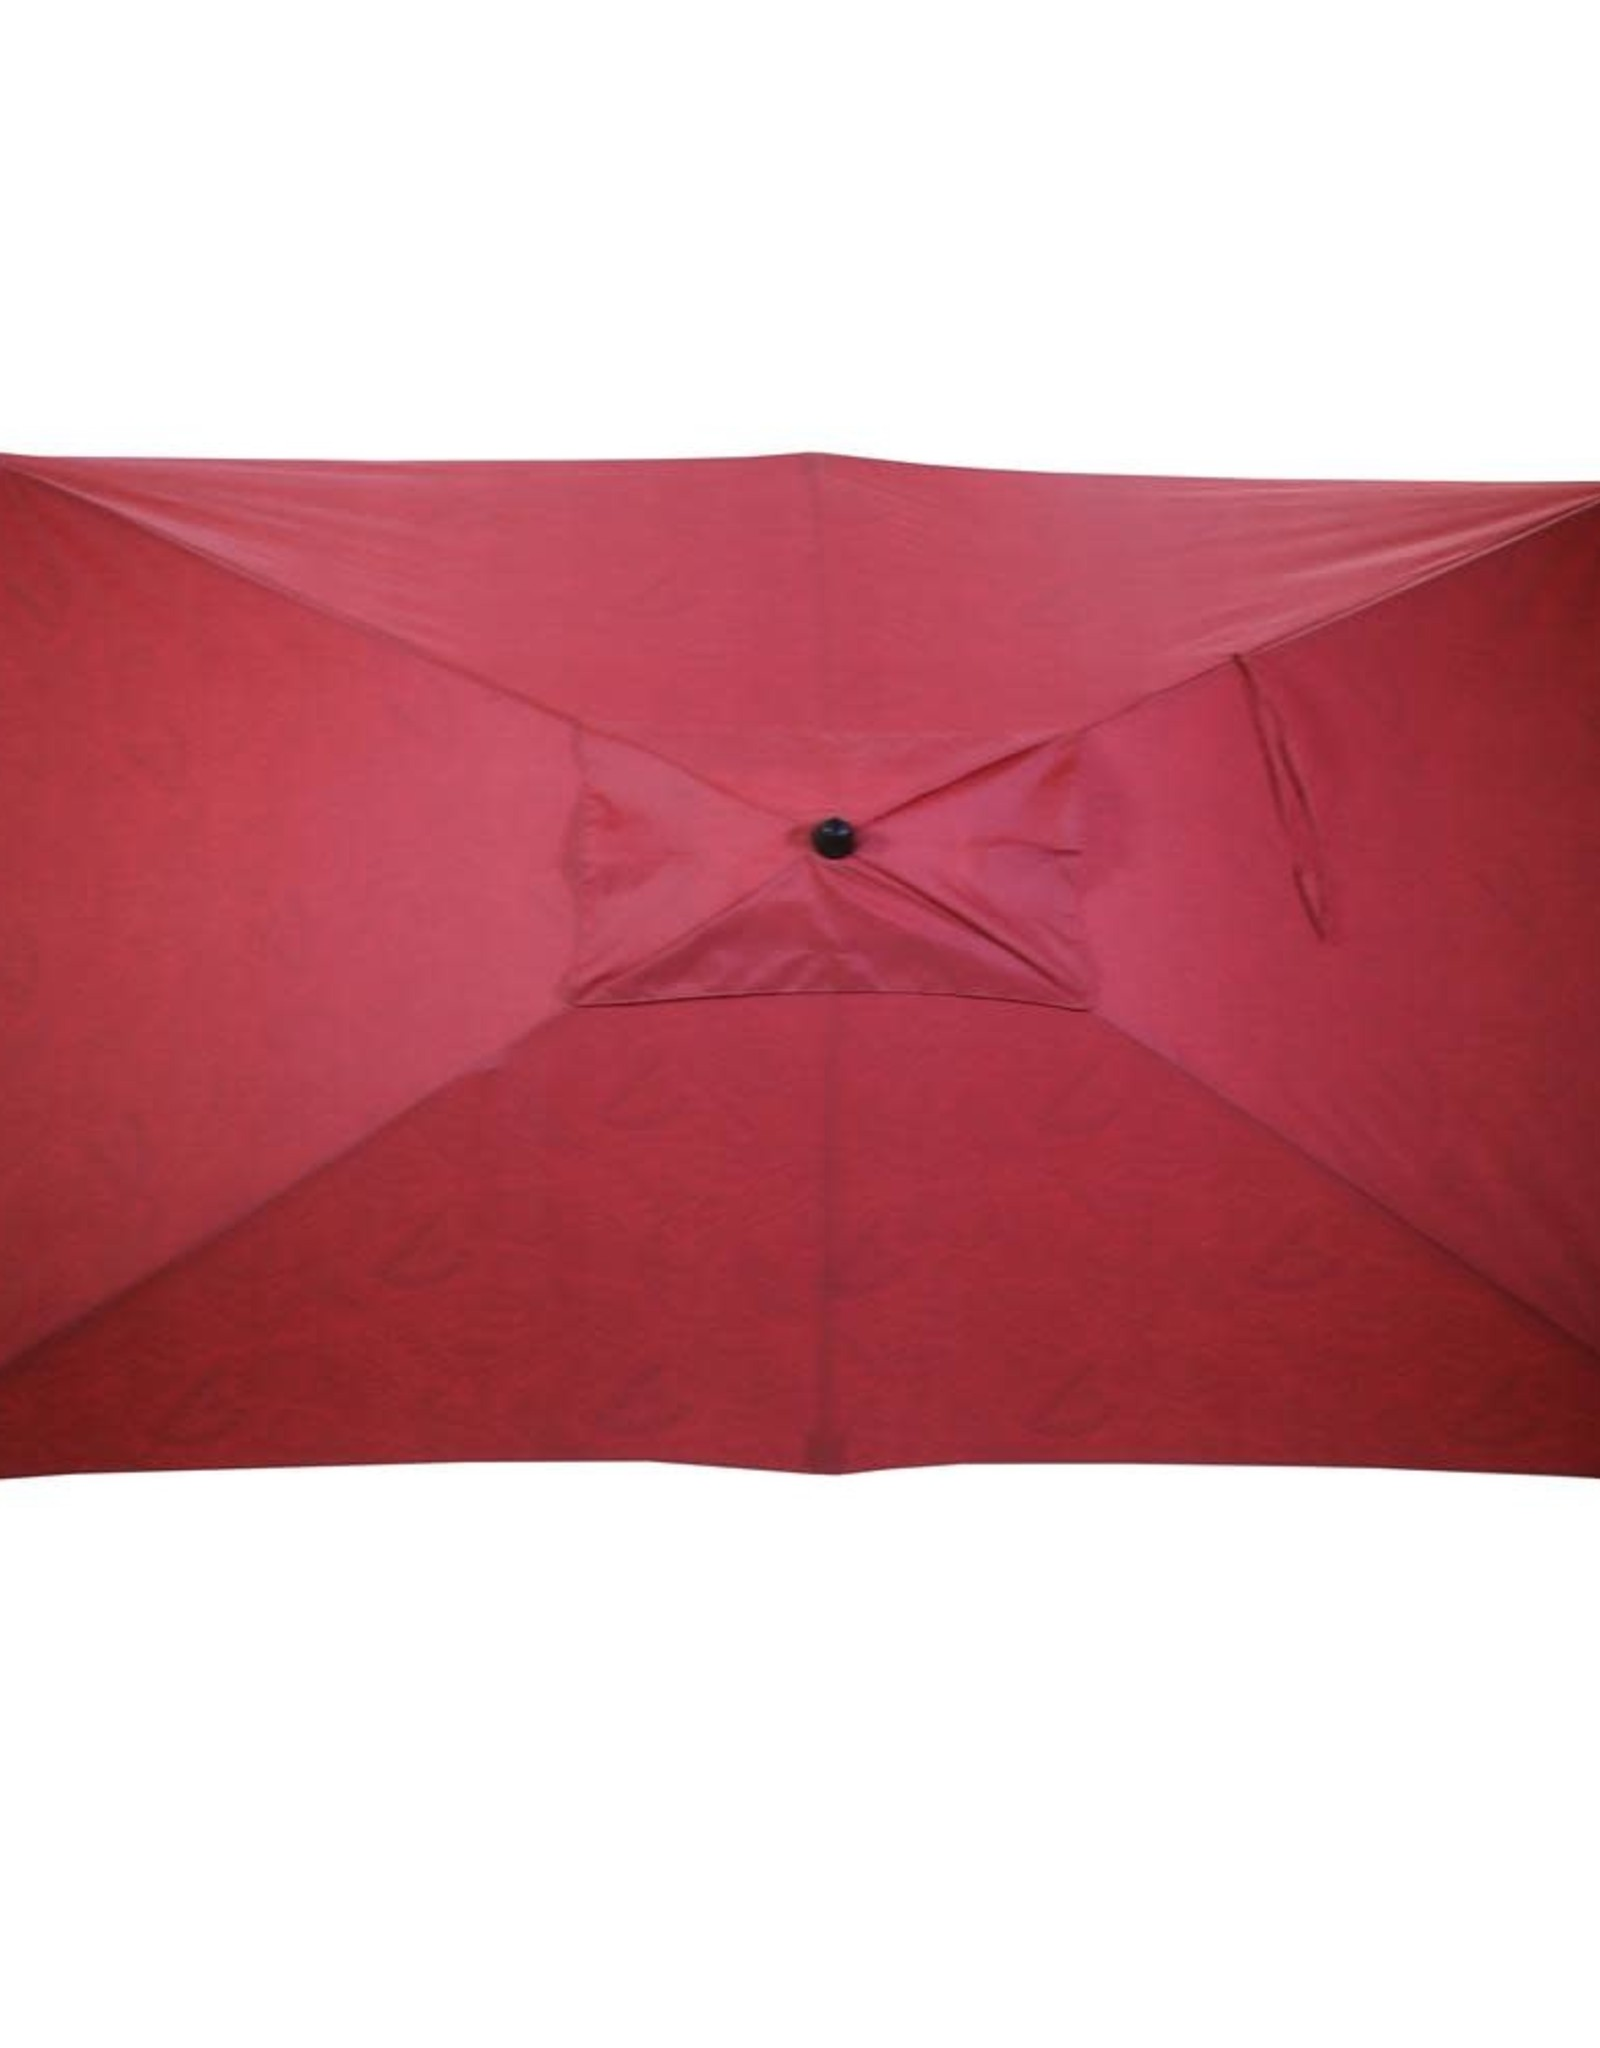 10 ft. x 6 ft. Aluminum Market Patio Umbrella in Chili Paisley with Push-Button Tilt